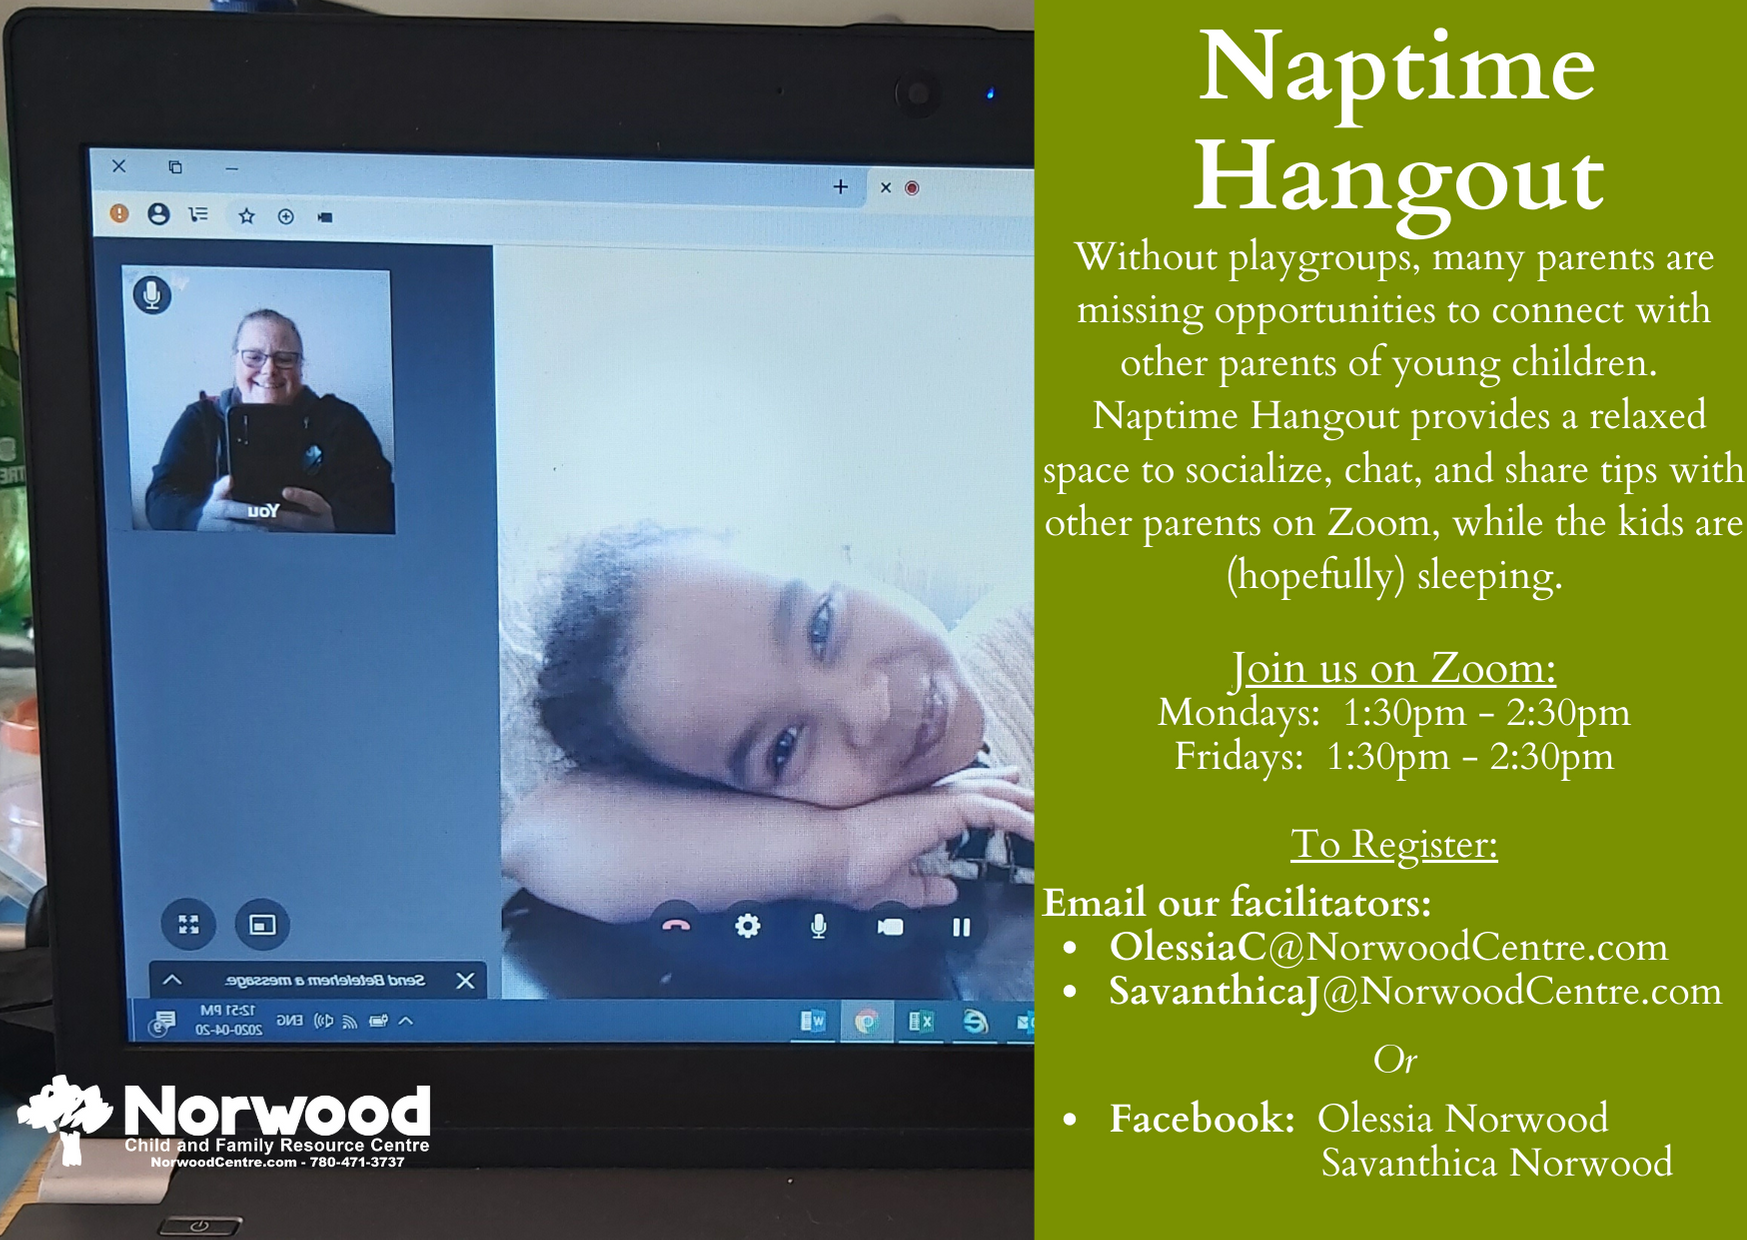 Naptime Hangout